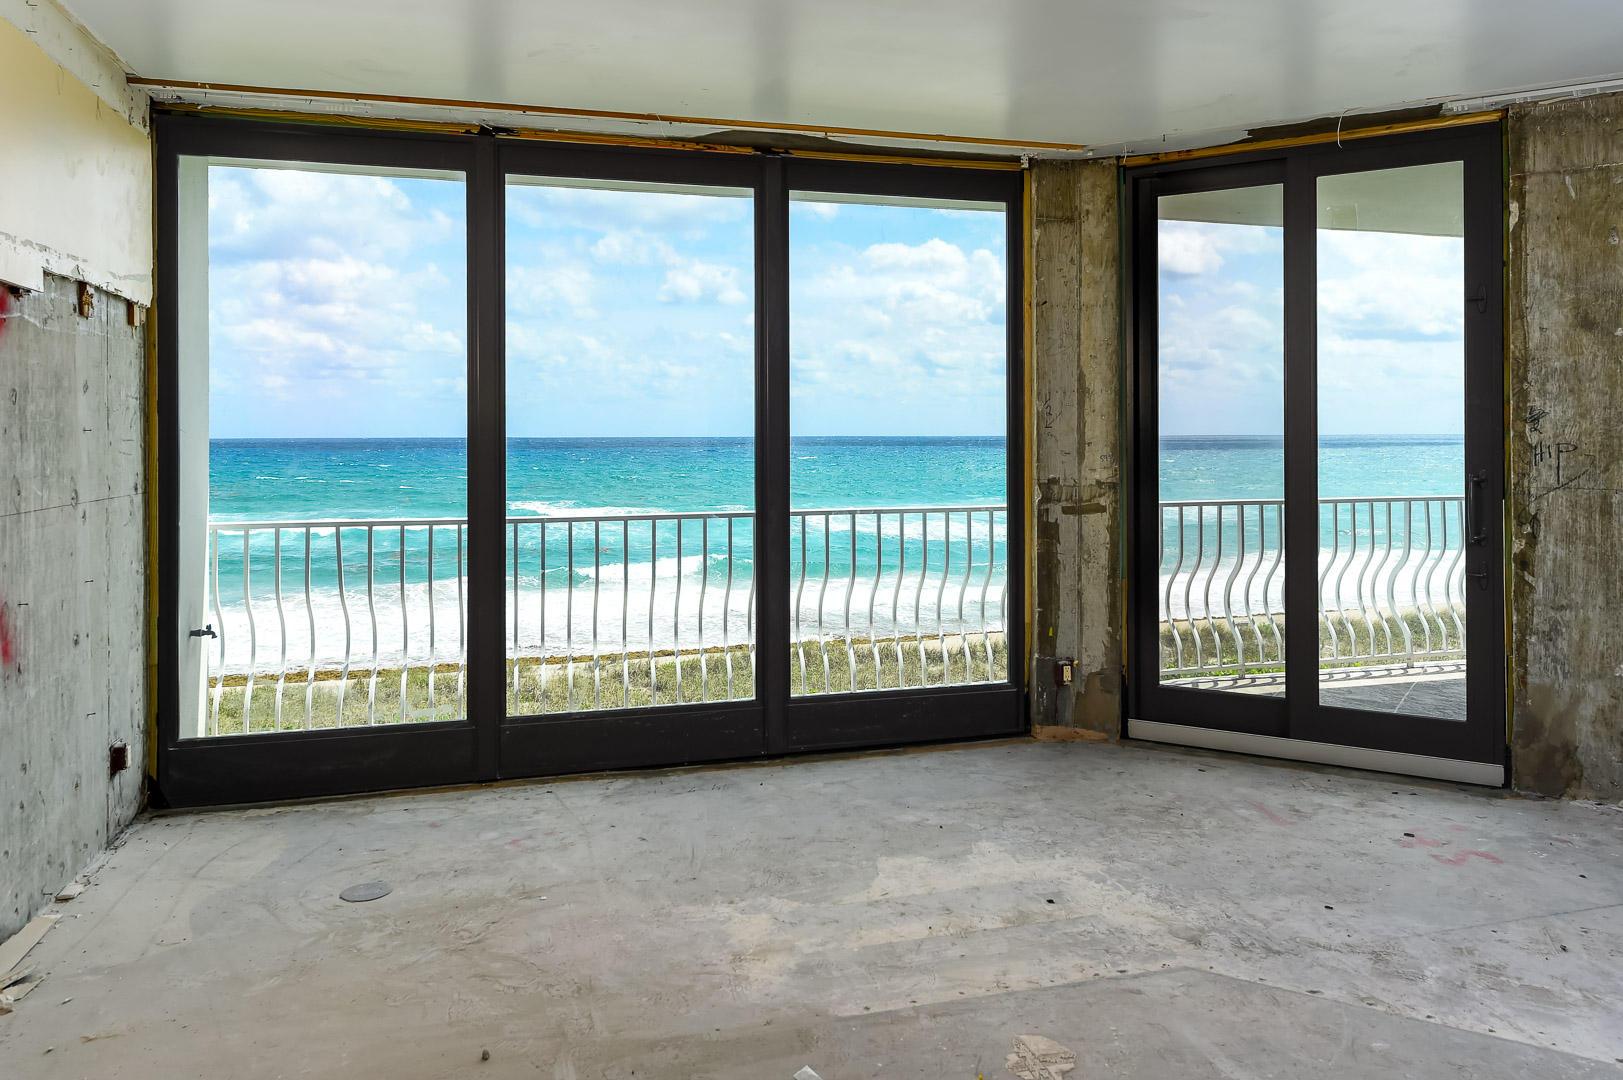 TWO THOUSAND CONDO PALM BEACH REAL ESTATE